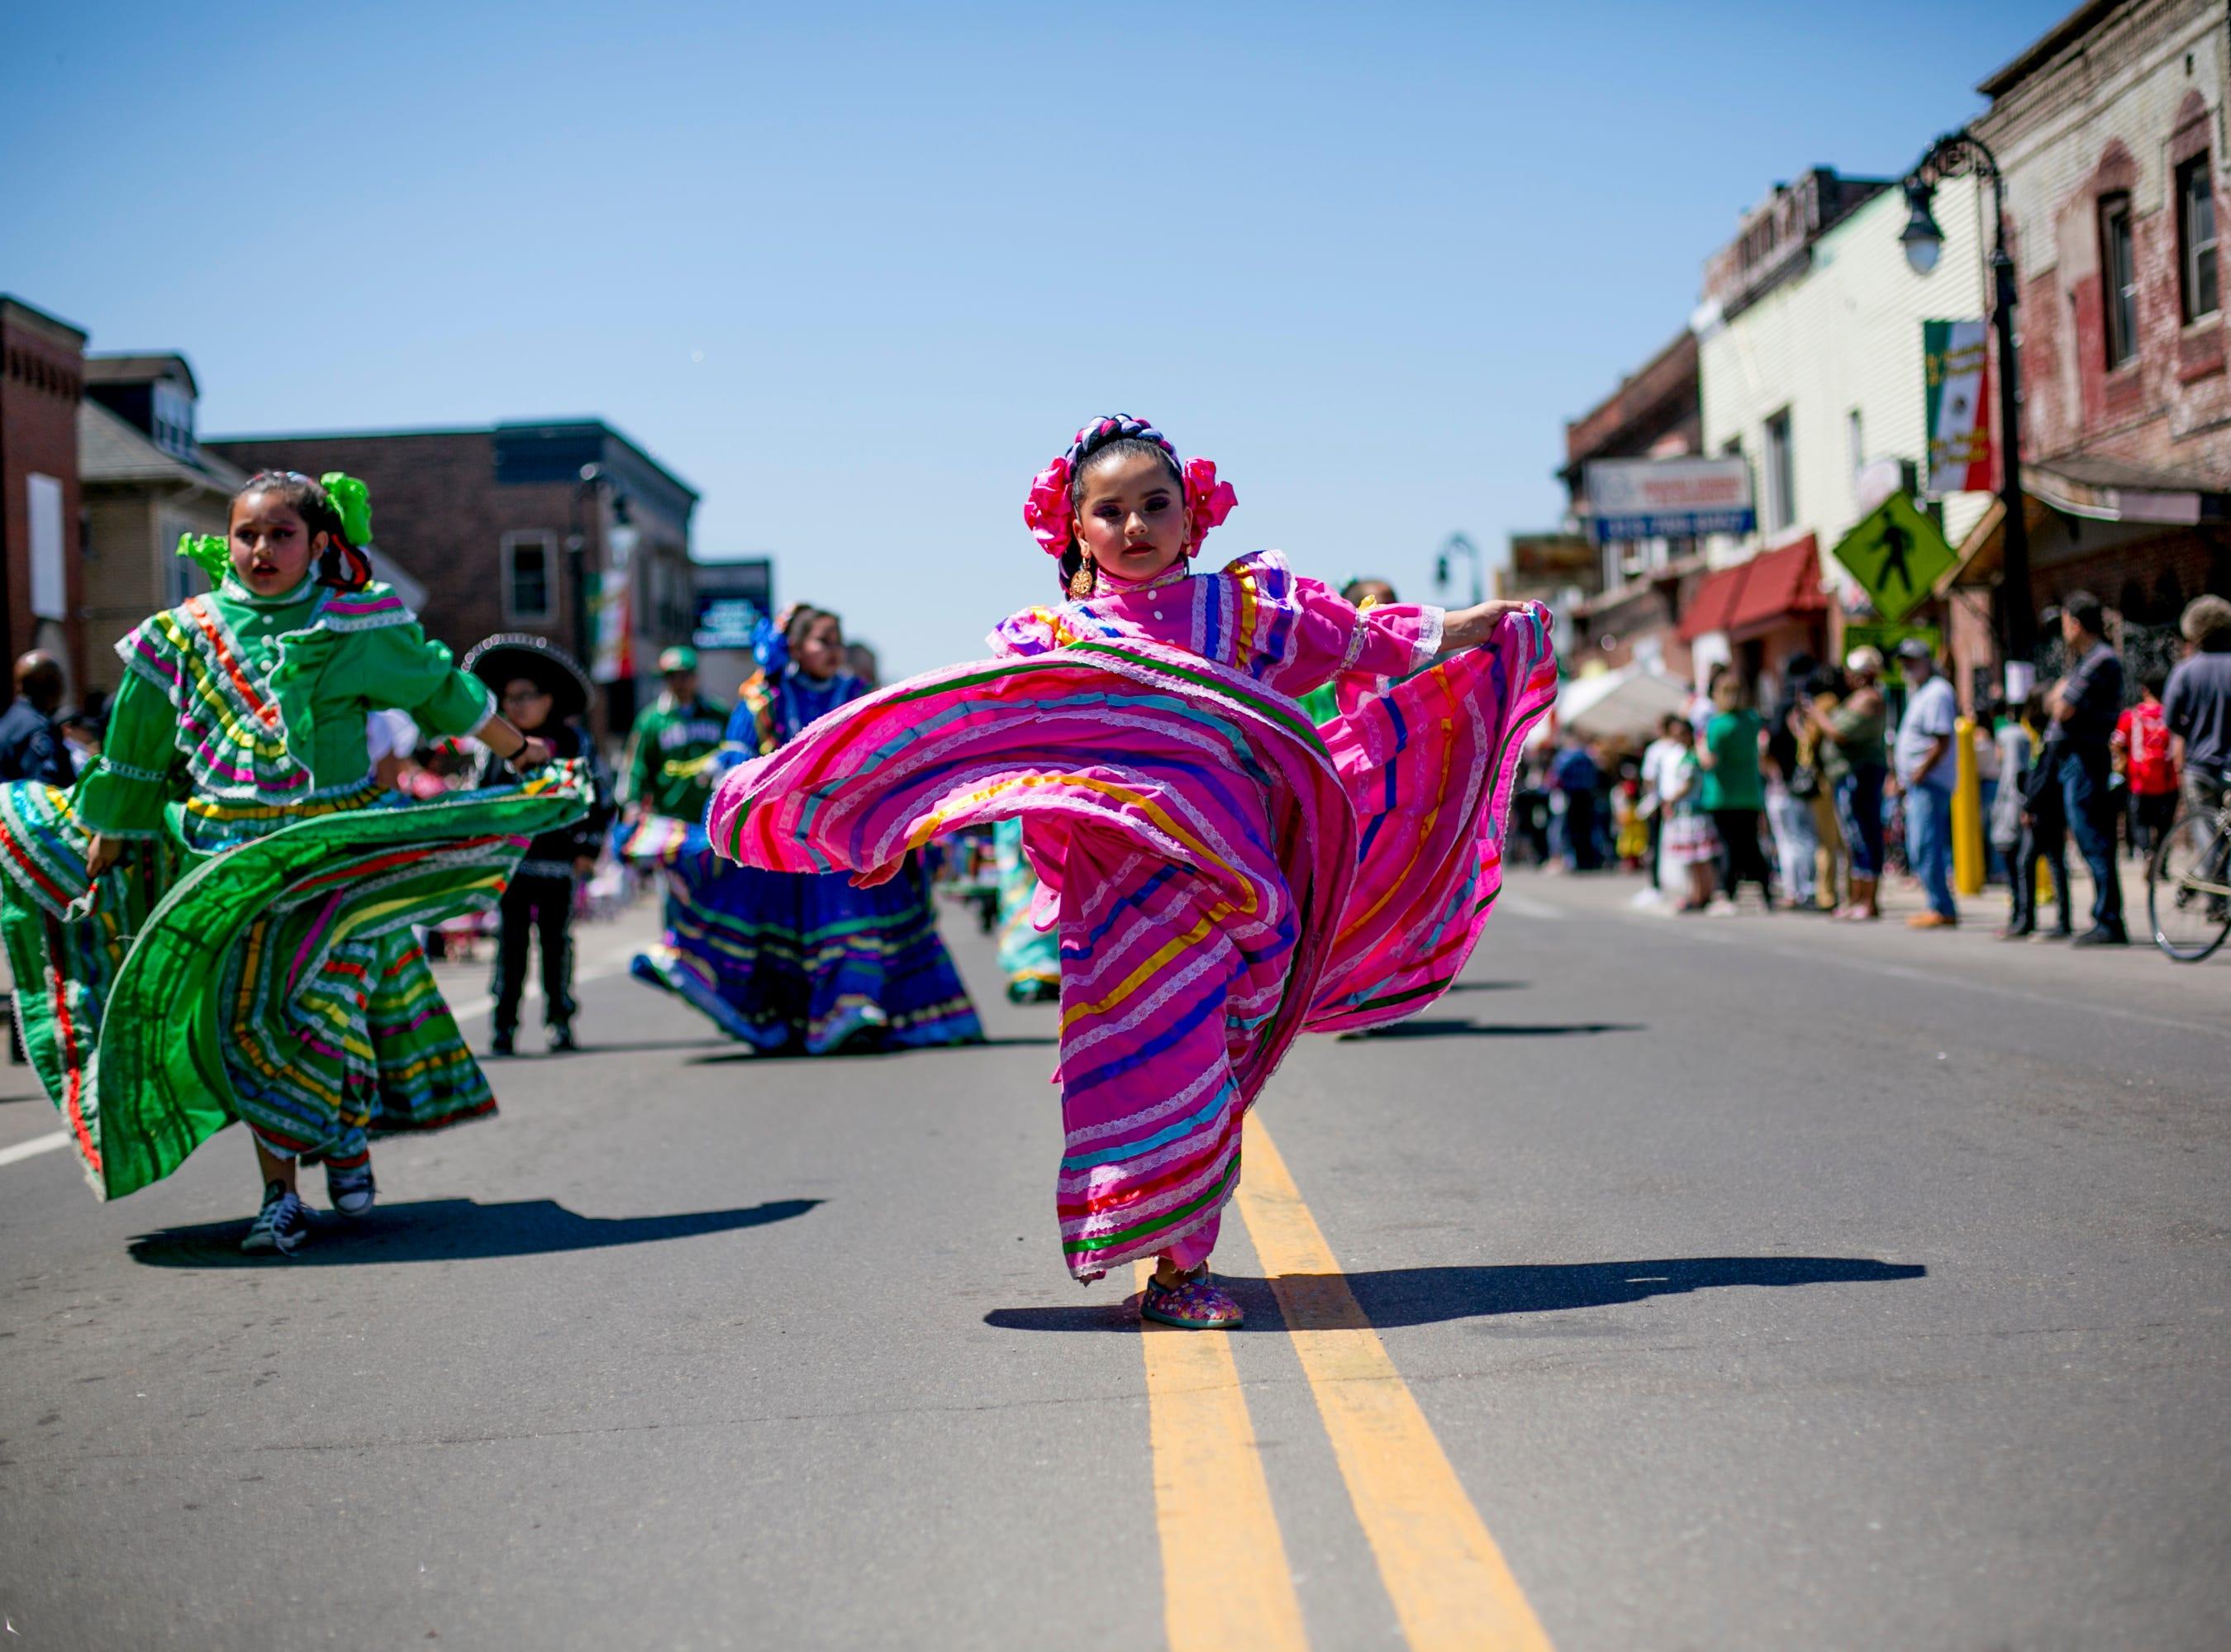 A girl from Ballet Folklórico De Detroit dances in the 55th Annual Cinco de Mayo parade along Vernor Highway in southwest Detroit, May 5, 2019.